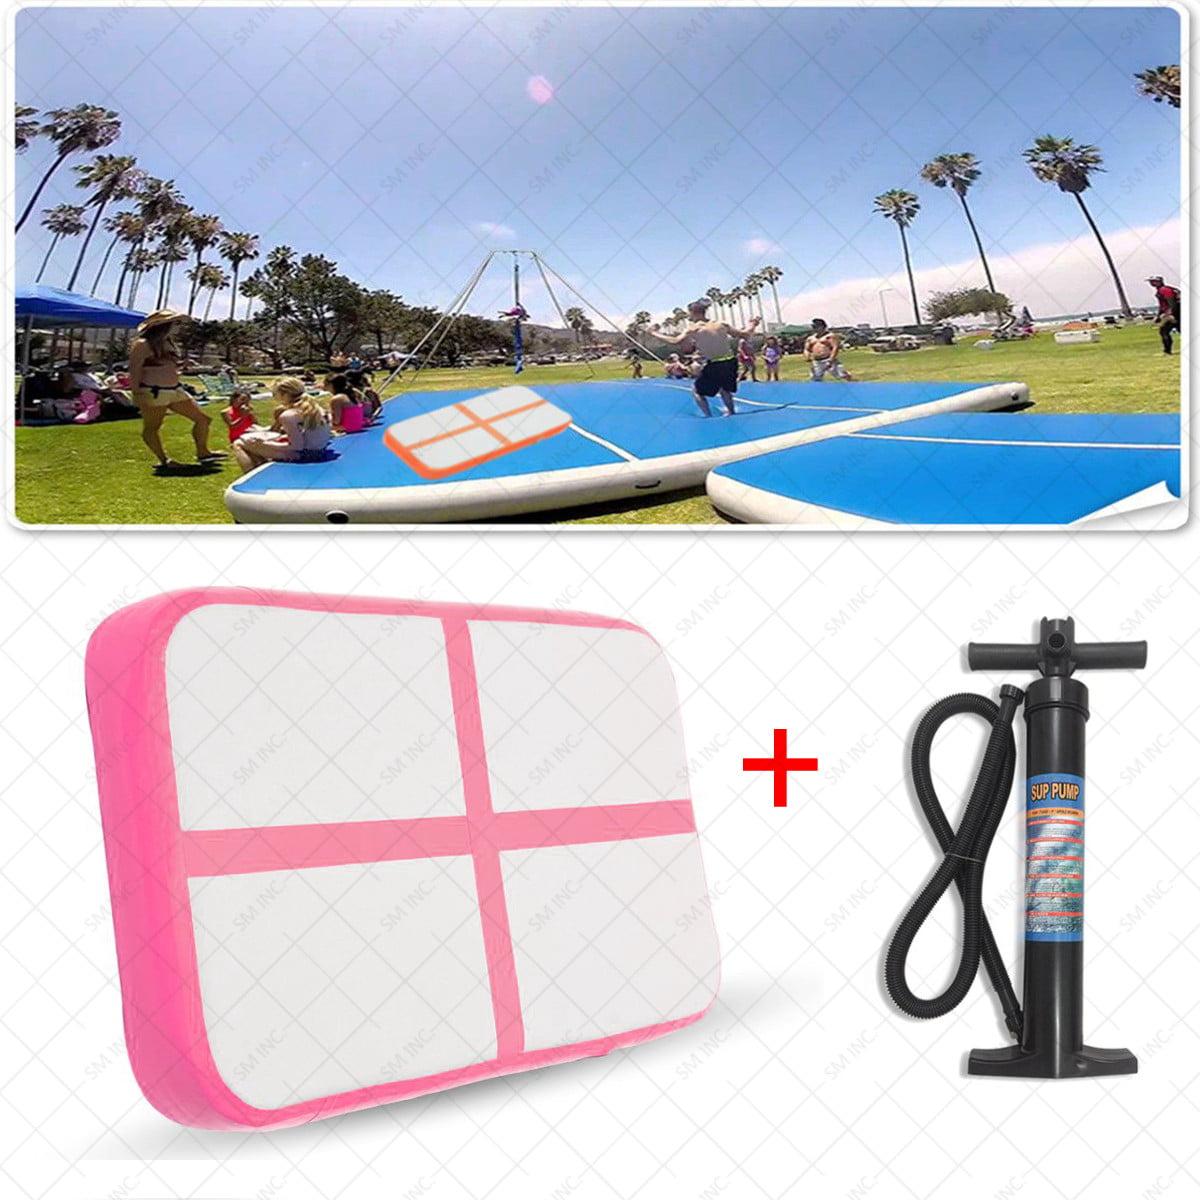 1Pcs 100x60x10cm Inflatable Gymnastics Cheerleading Air Track Floor Tumbling Gym Mat + Hand Pump by